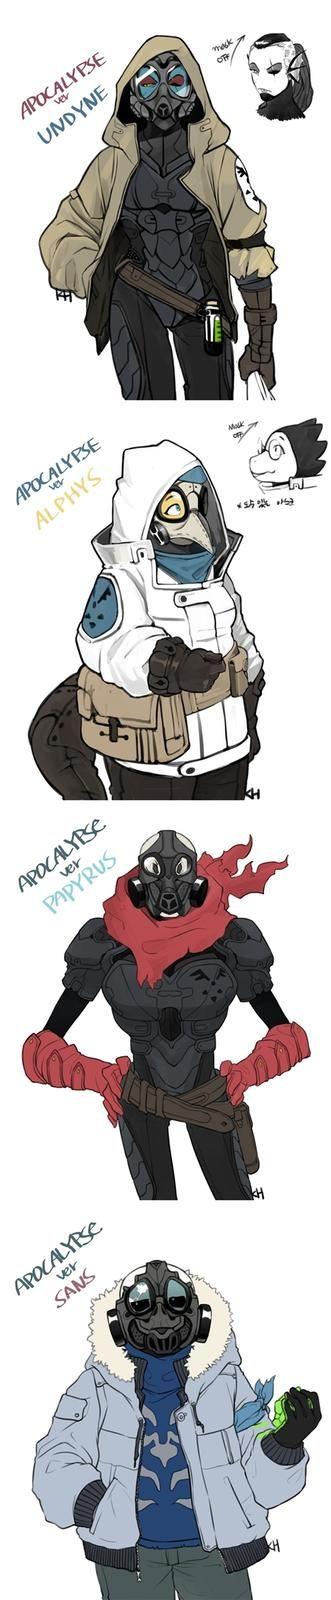 Apocalypse AU